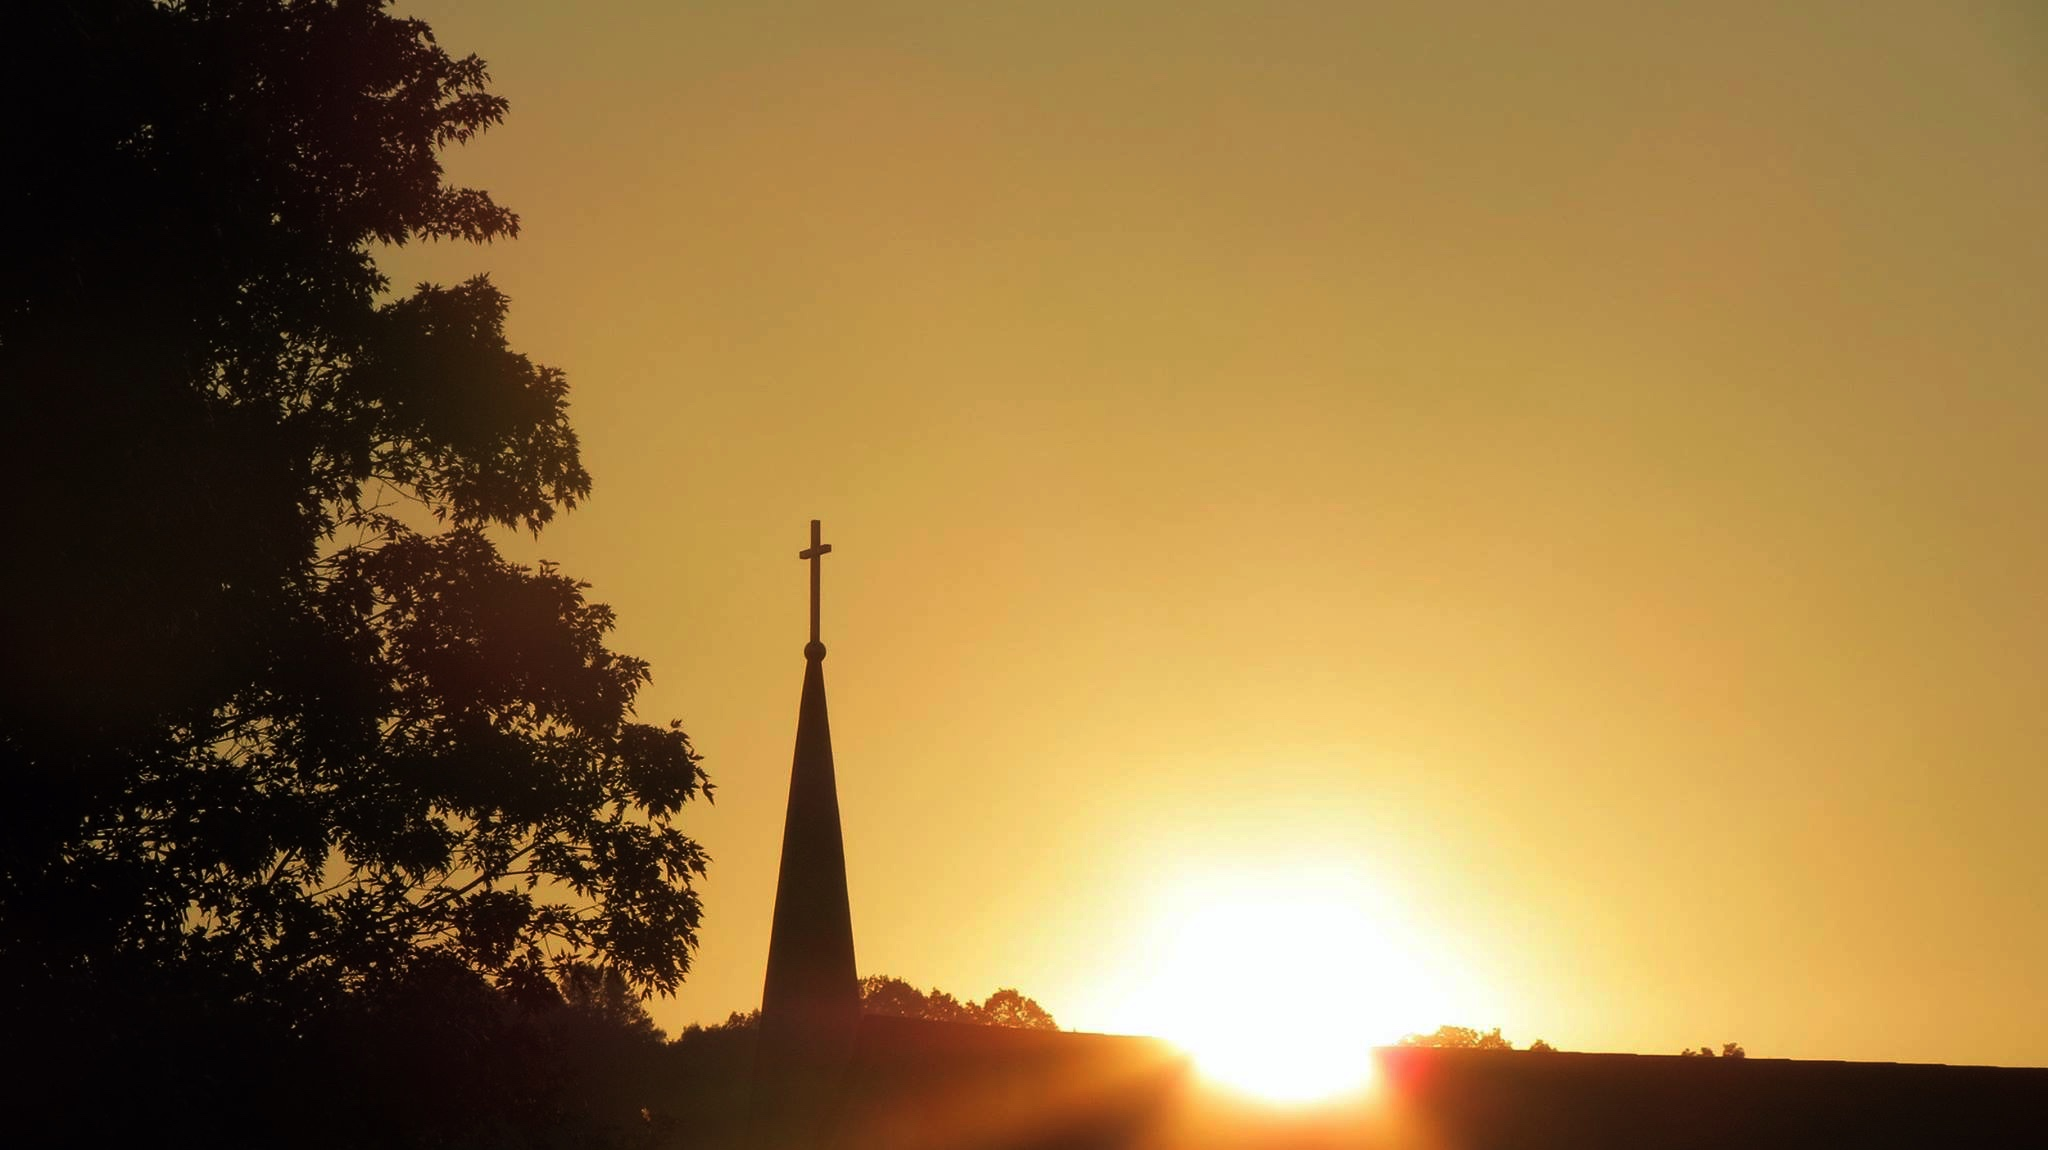 church steeple sunset